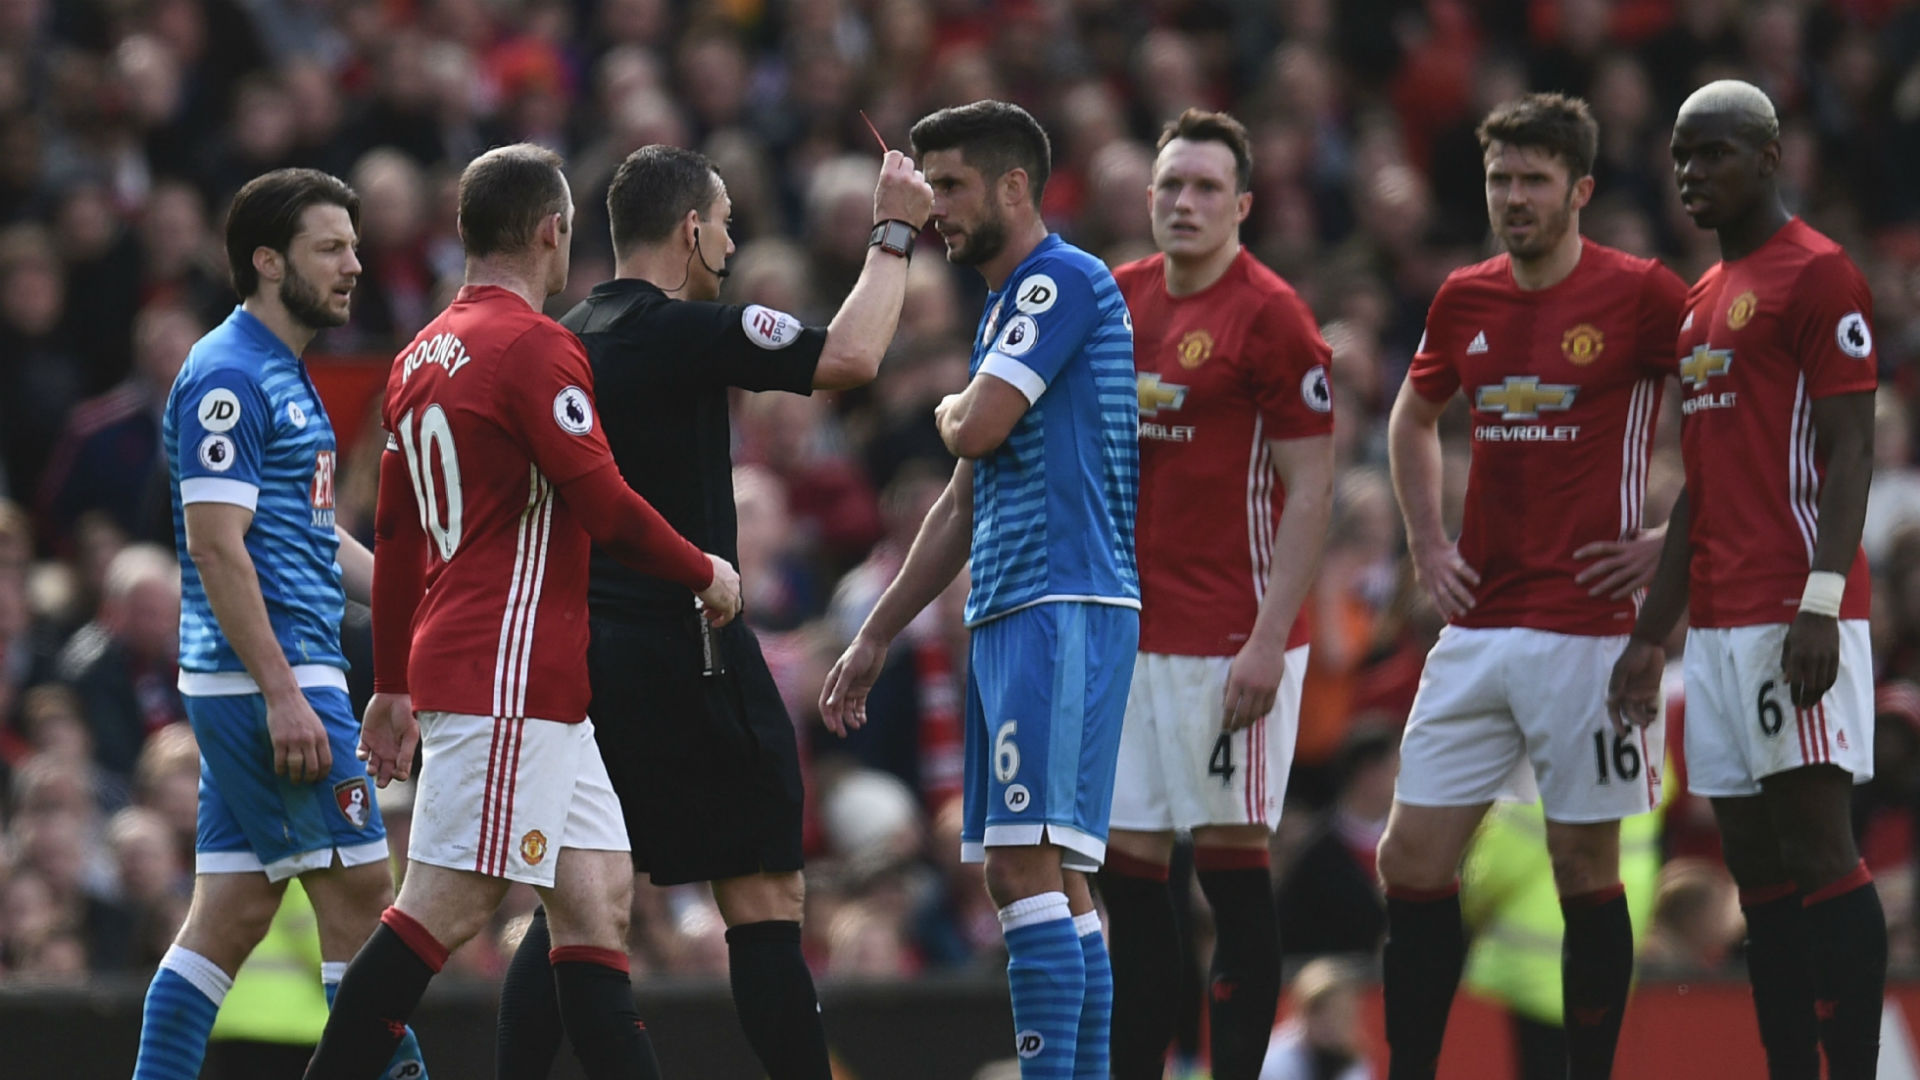 Andrew Surman Premier League Manchester United v Bournemouth